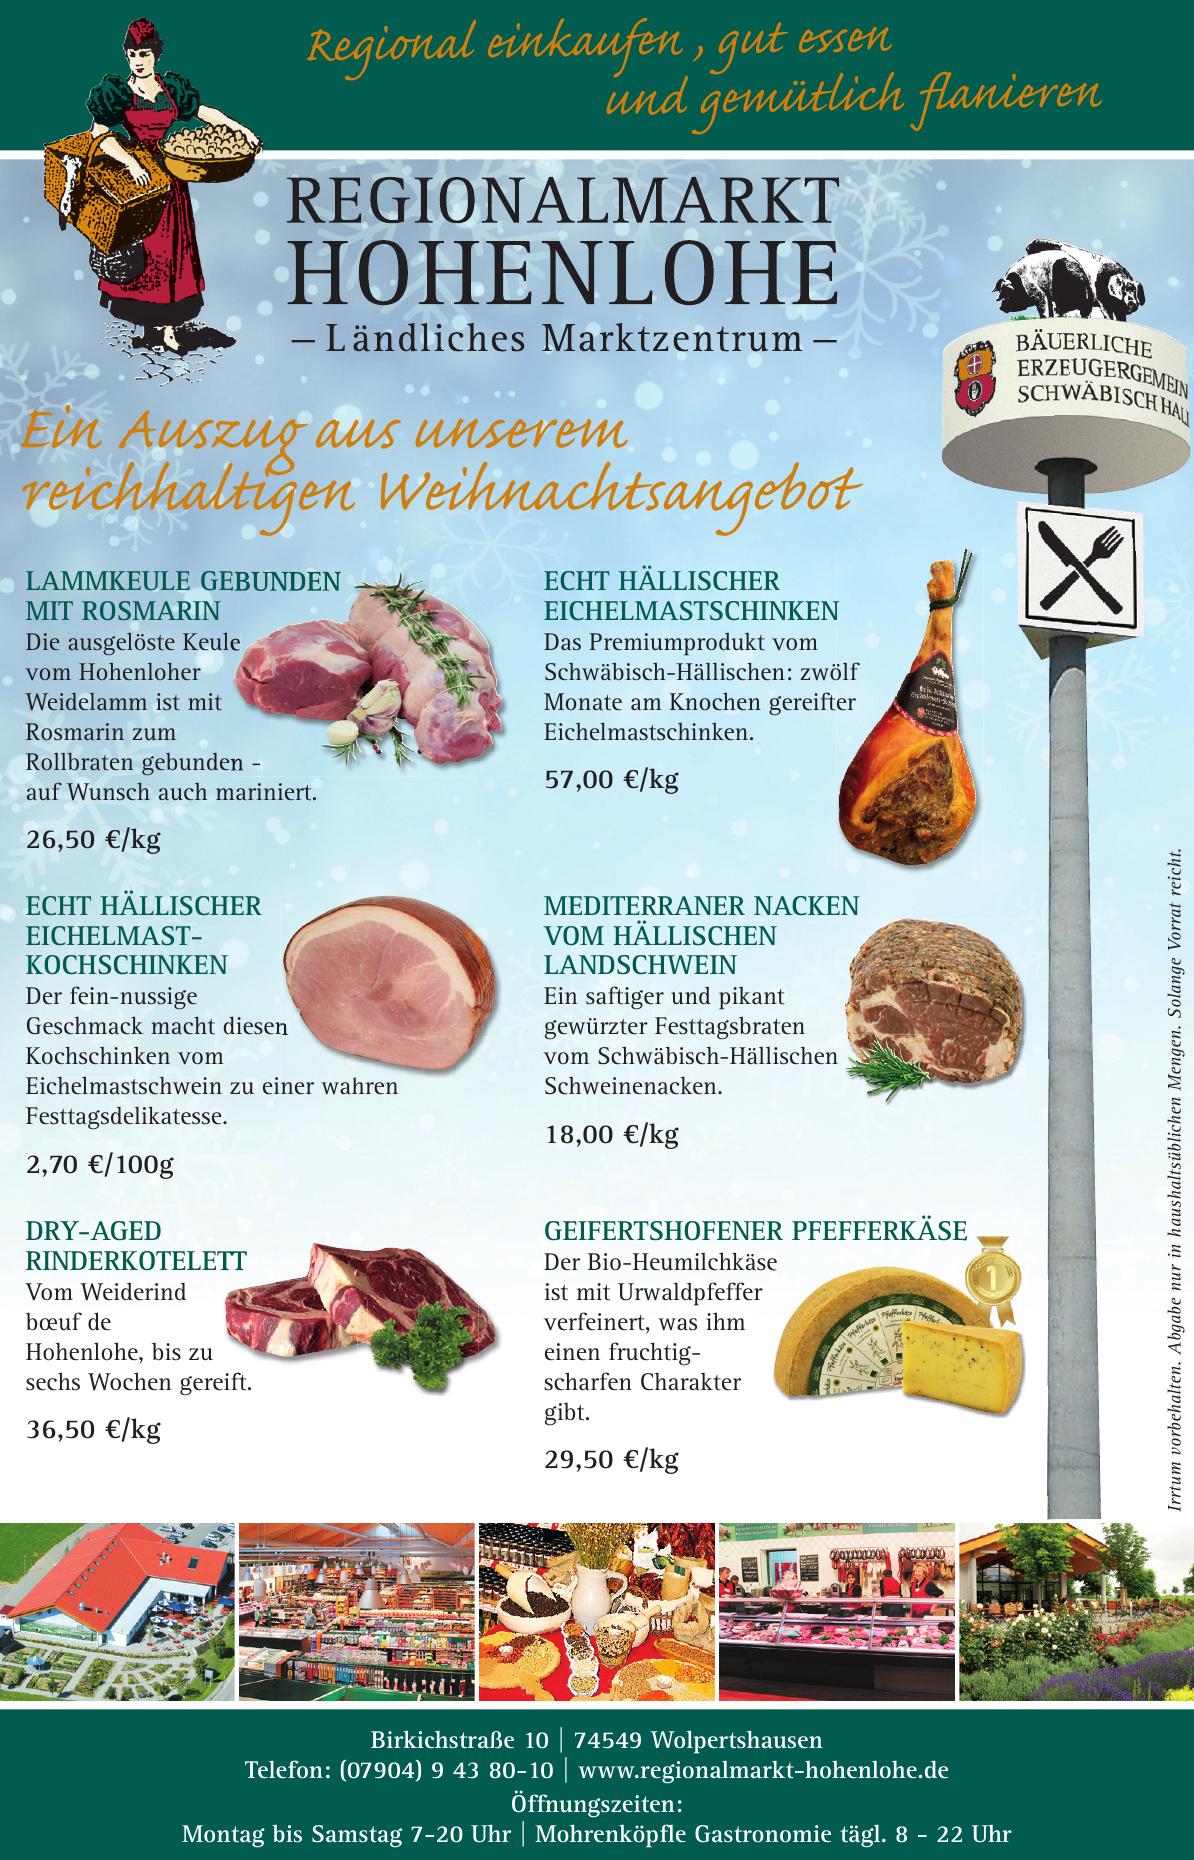 Regionalmarkt Hohenlohe